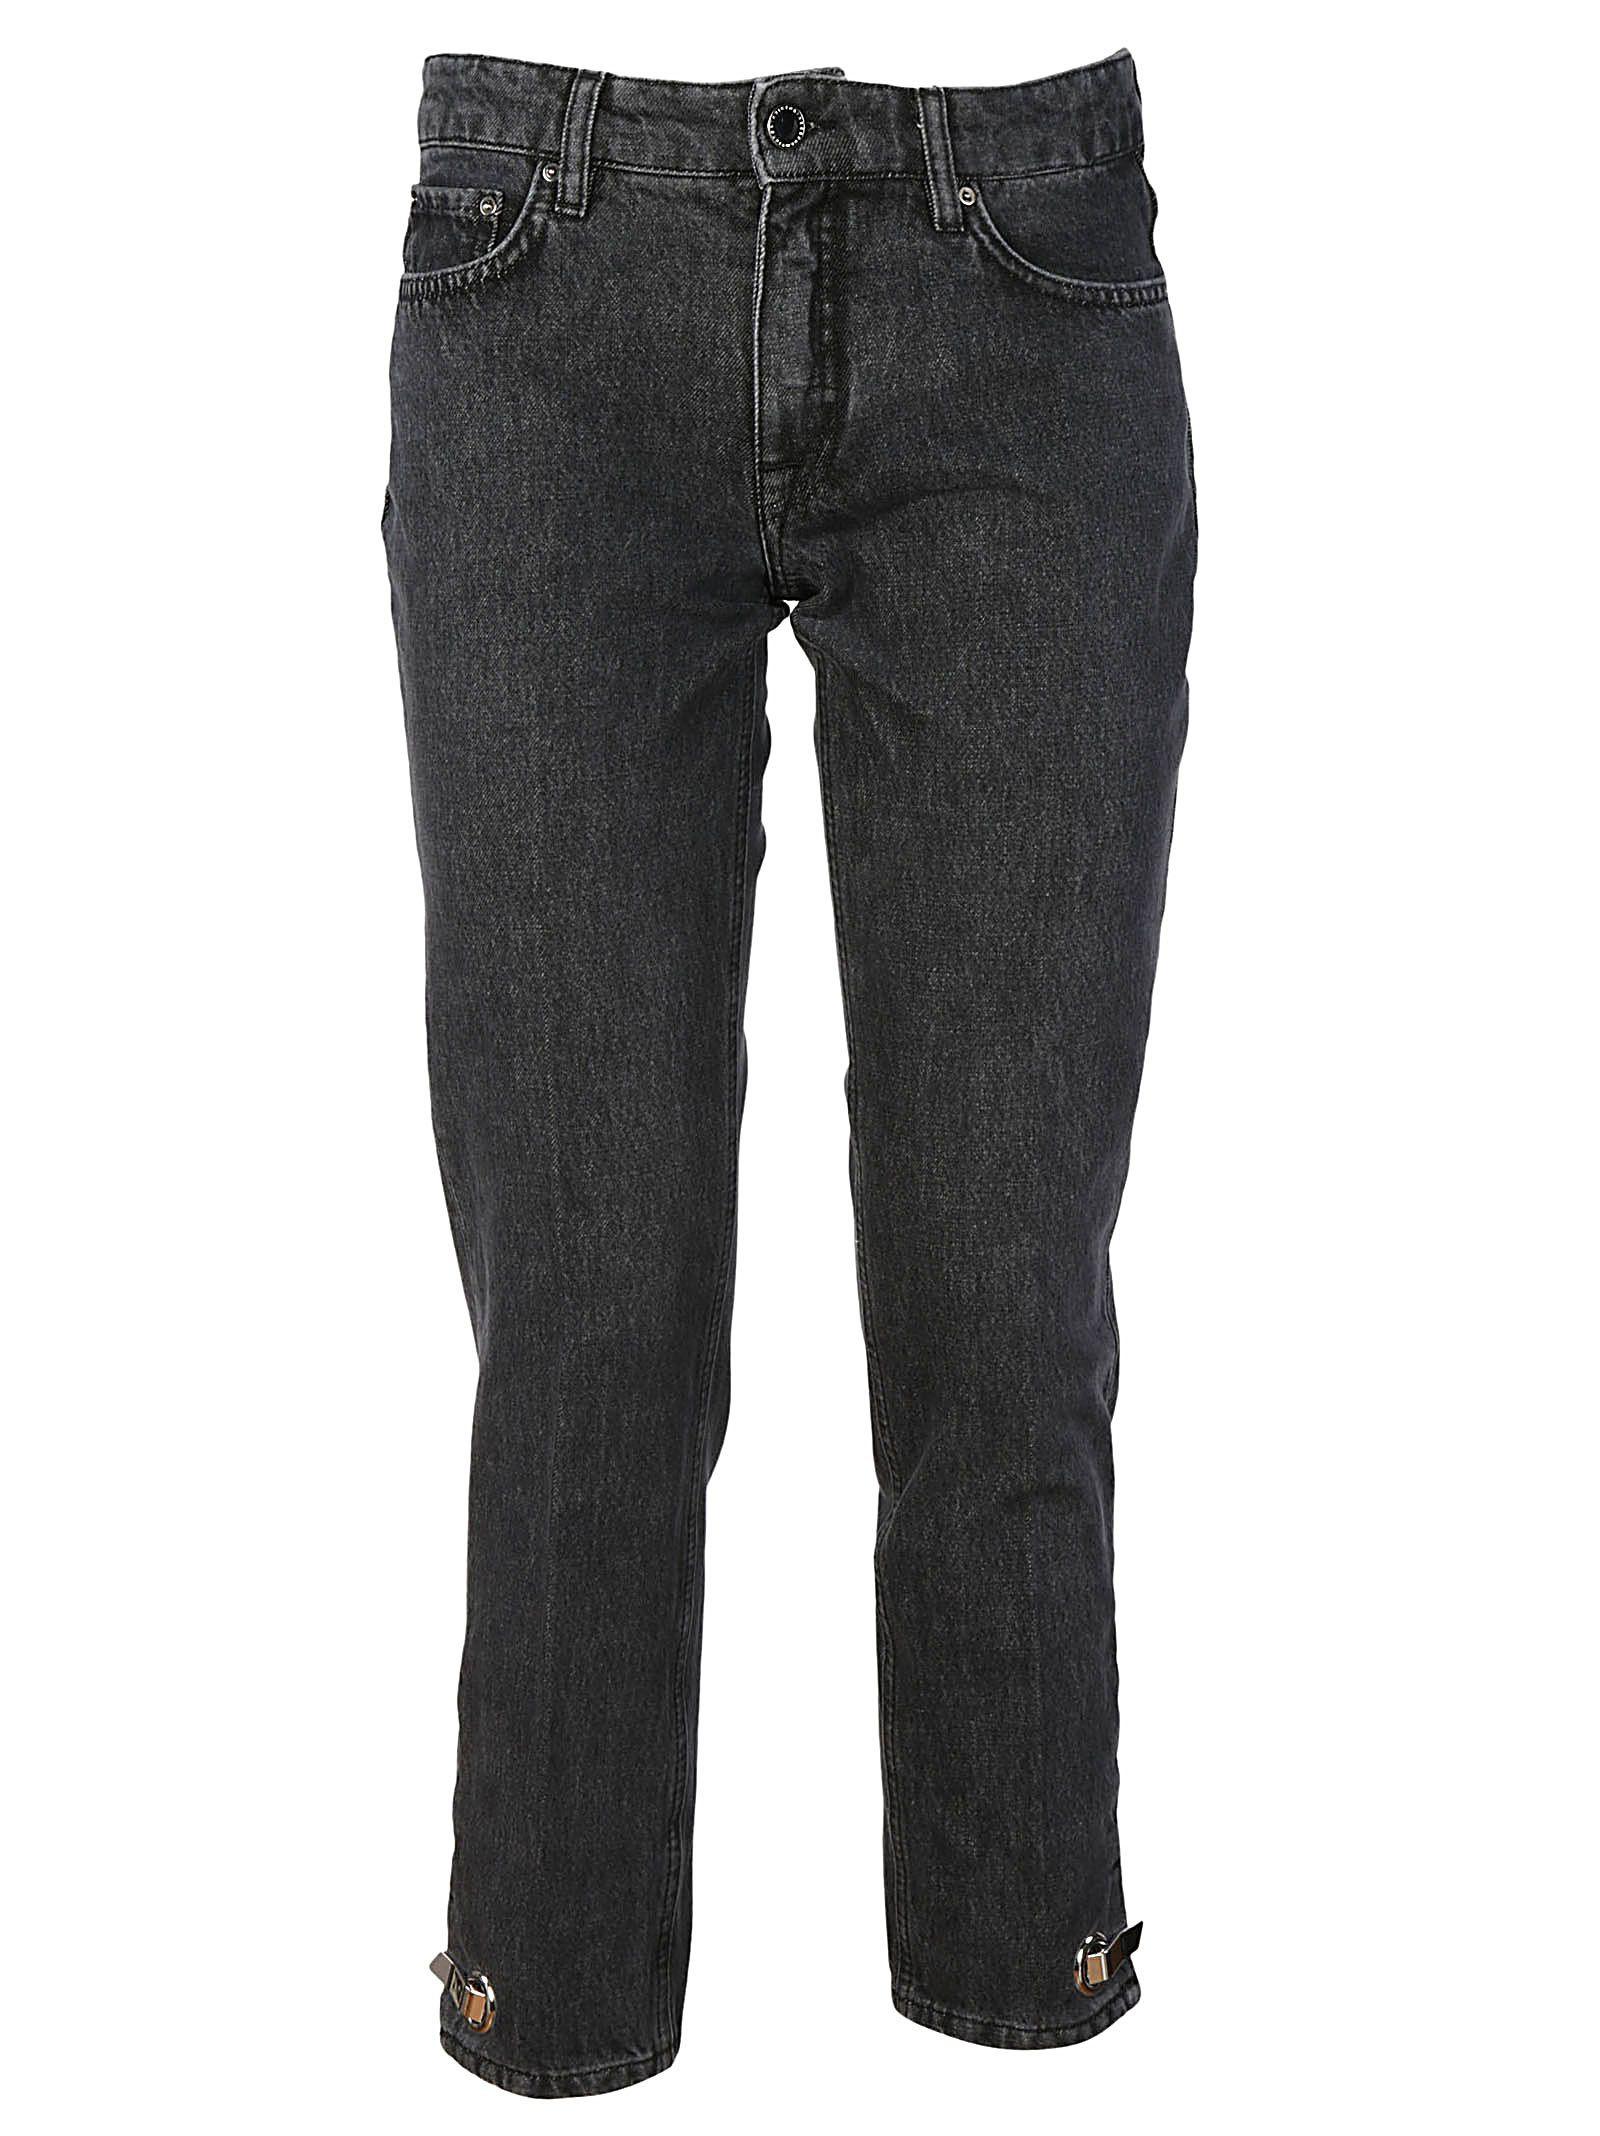 cropped jeans - Black Victoria Beckham 31YcXEJ8